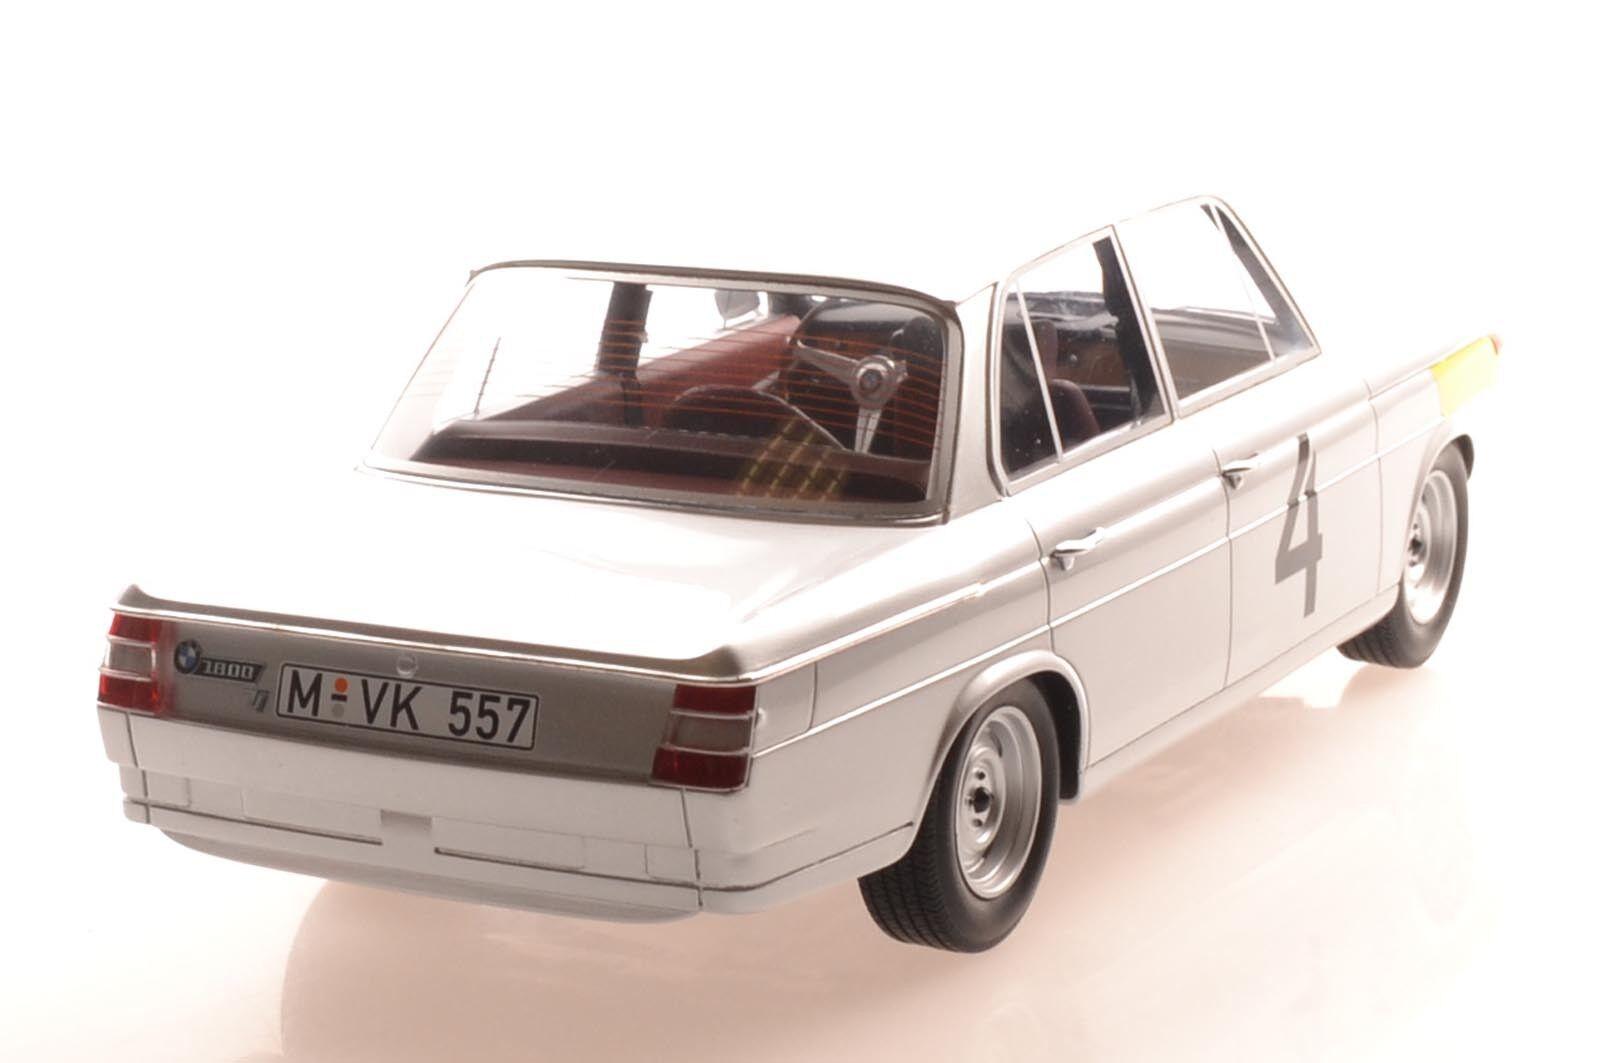 MINICHAMPS 107652504 BMW 1800 1800 1800 TISA ICKS/Van Ophem 24 H Spa 1965 1:18 Nouveau/Neuf dans sa boîte   D'adopter La Technologie De Pointe  4ae534